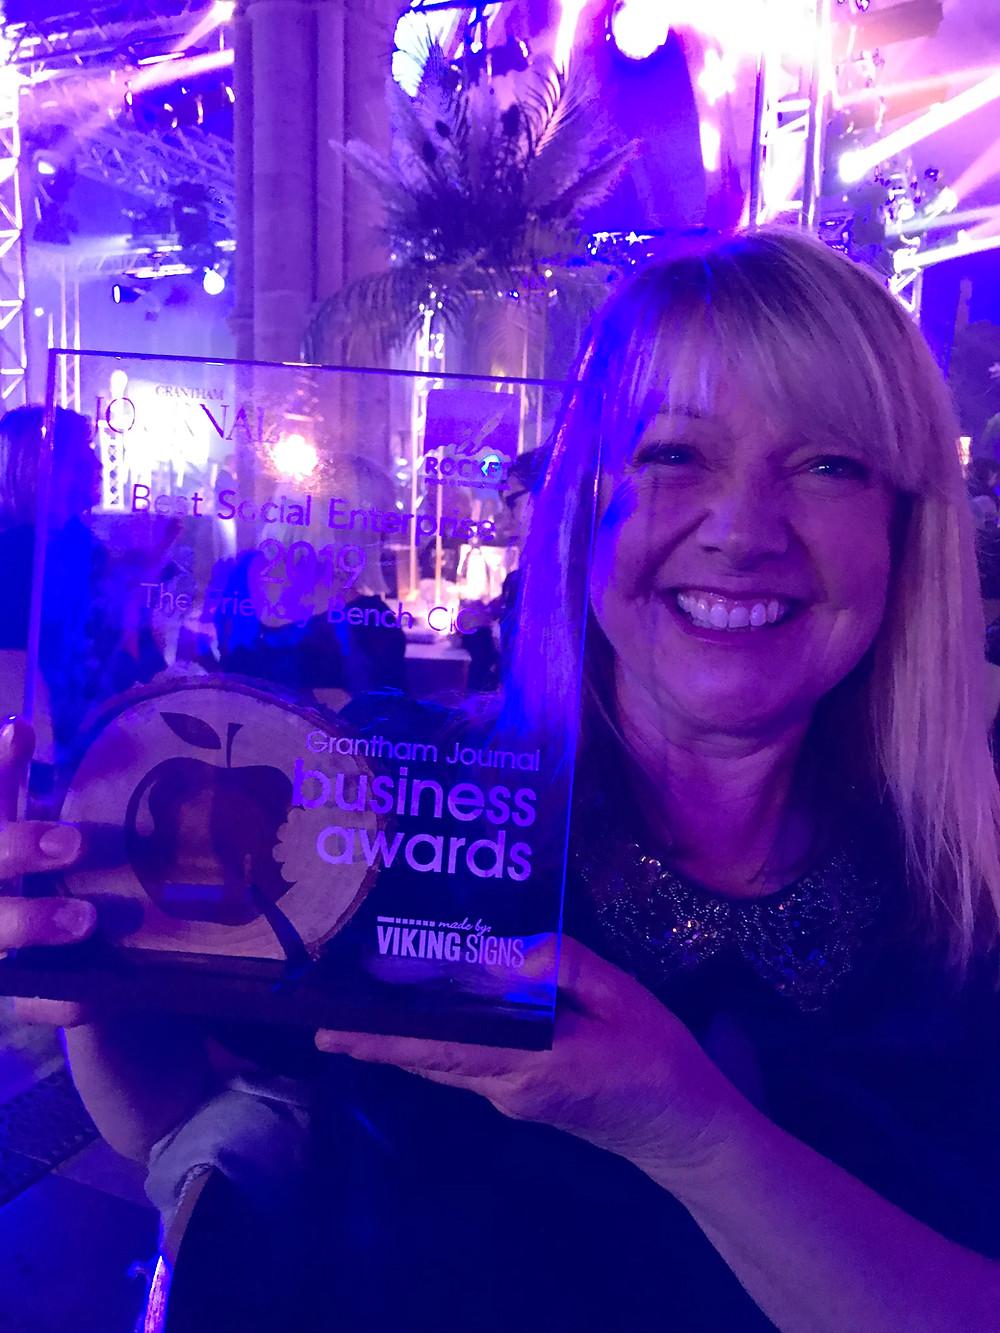 The Friendly Bench™ CIC wins Best Social Enterprise award